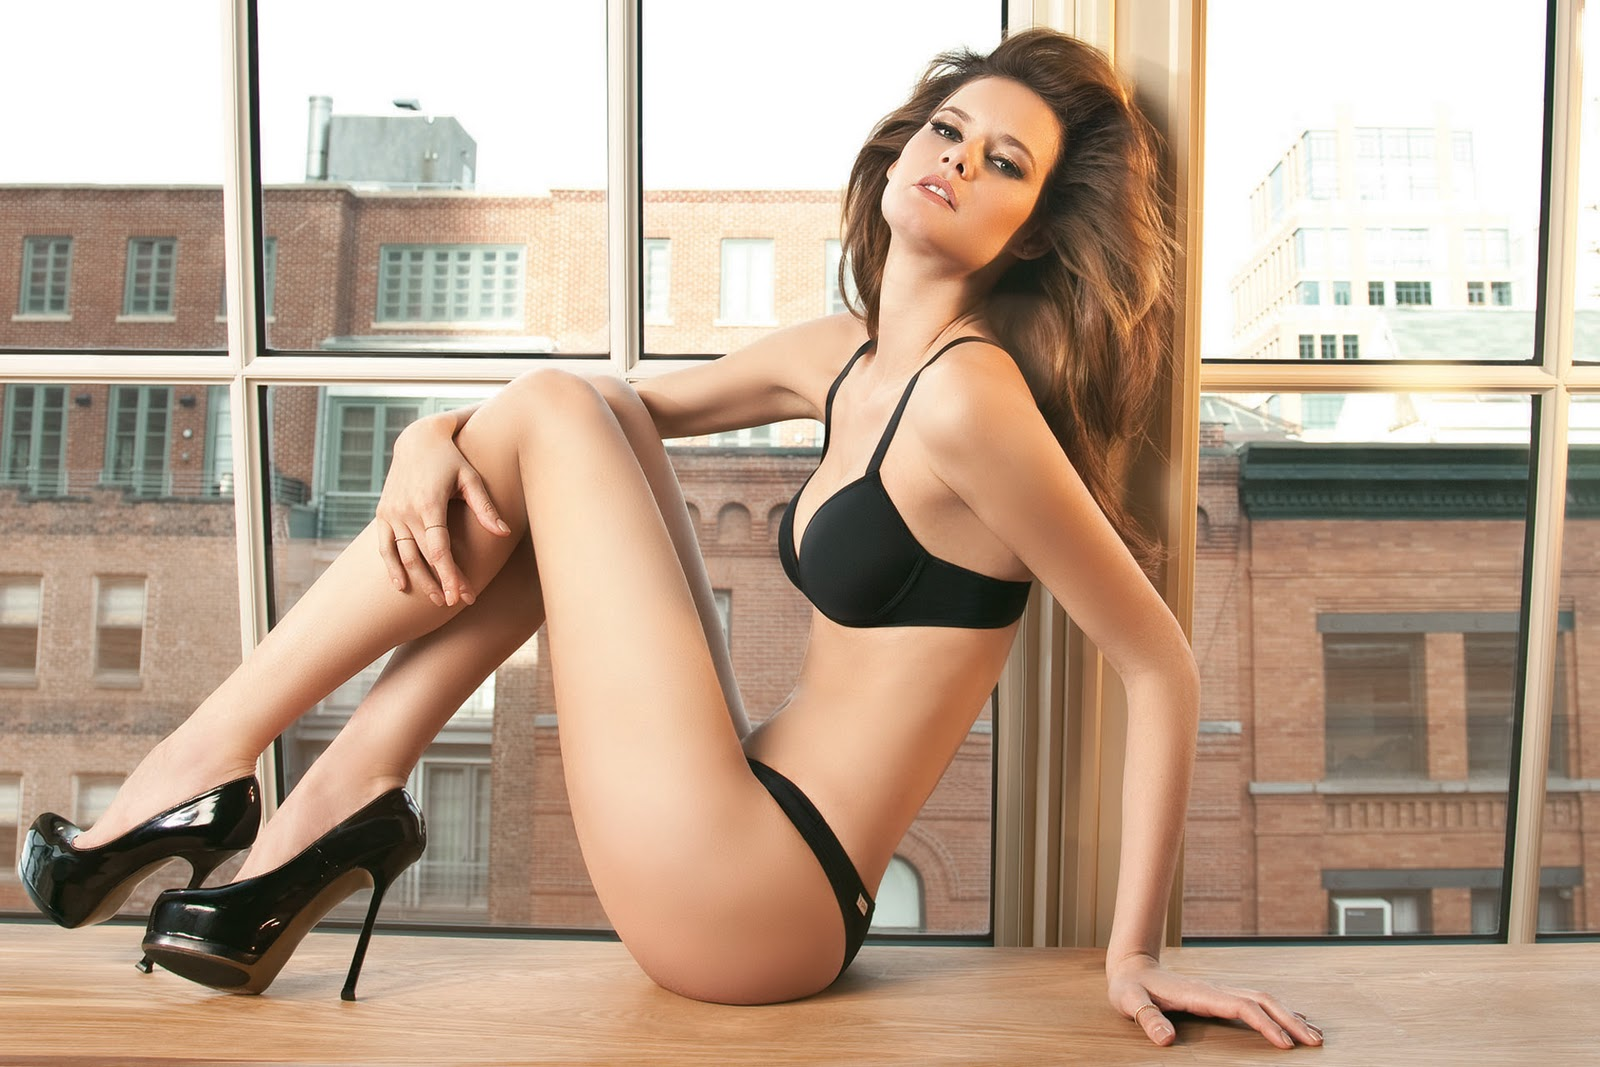 Hot Ana Cristina nude (97 photos), Topless, Sideboobs, Boobs, bra 2017